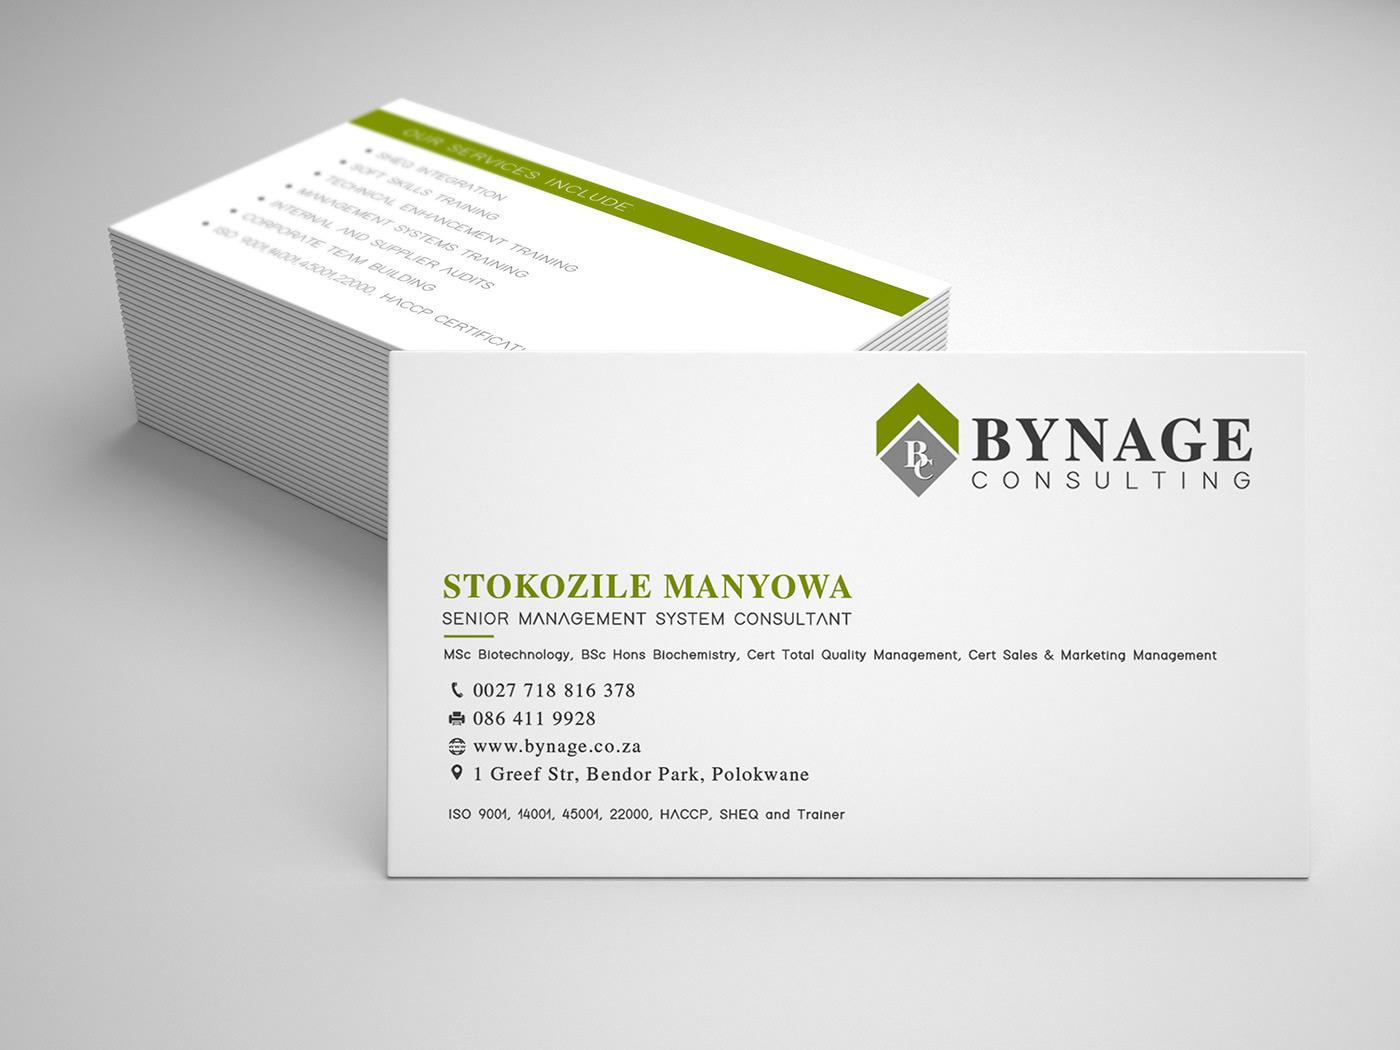 bynage 2